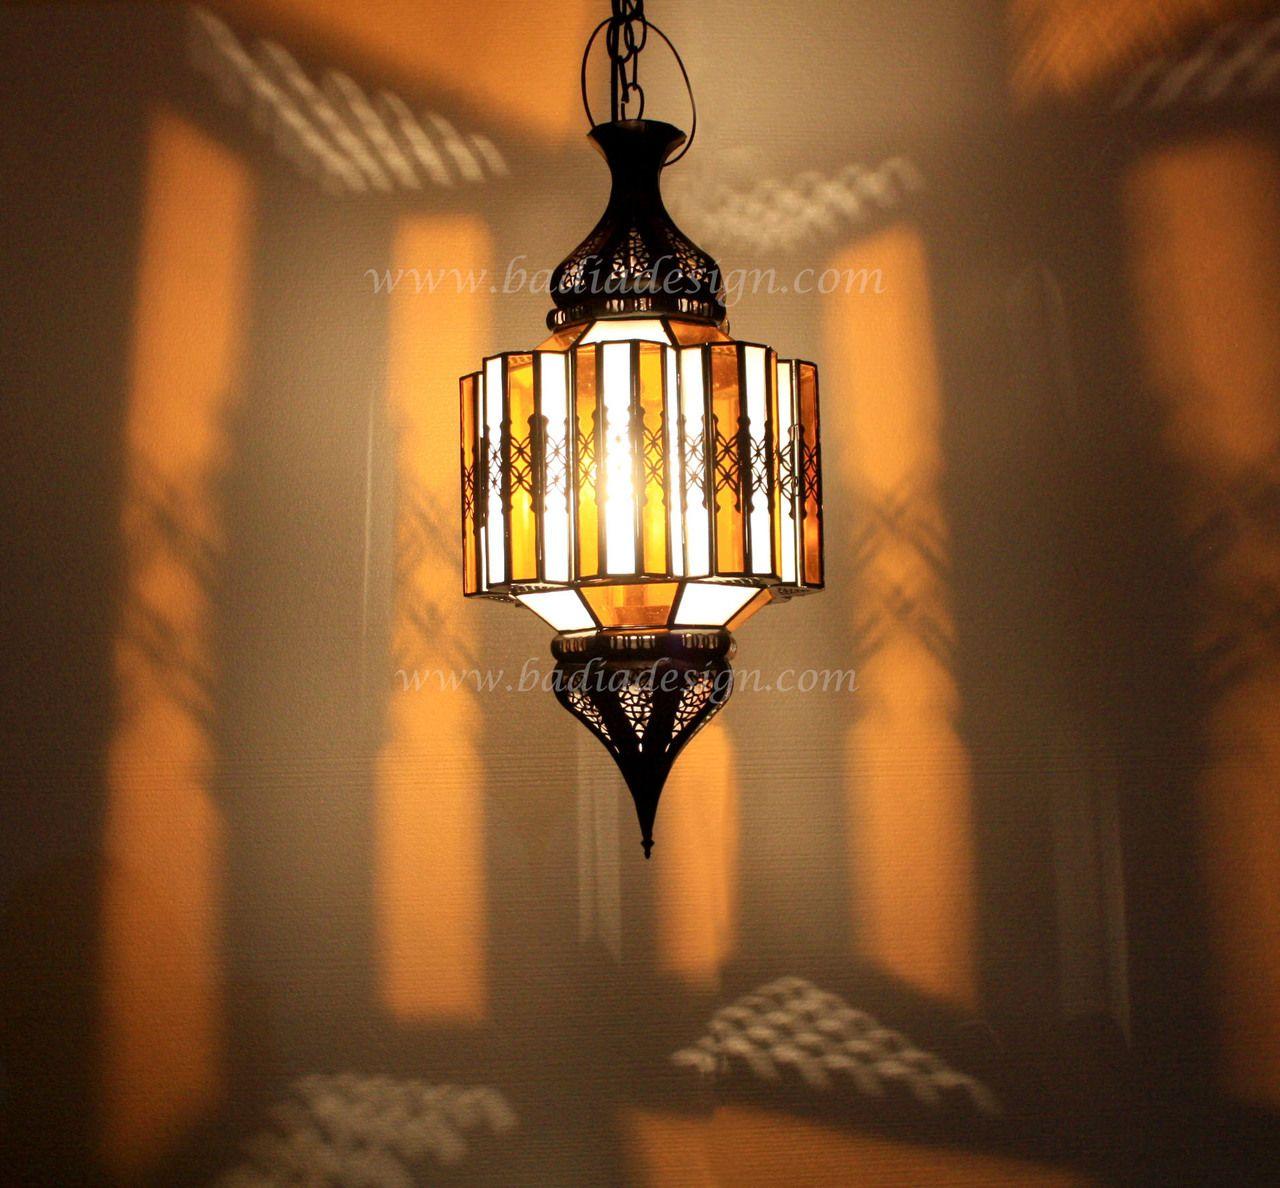 Hanging Glass Lantern - LIG107 & Hanging Glass Lantern - LIG107 | Tent lighting Moroccan and ...